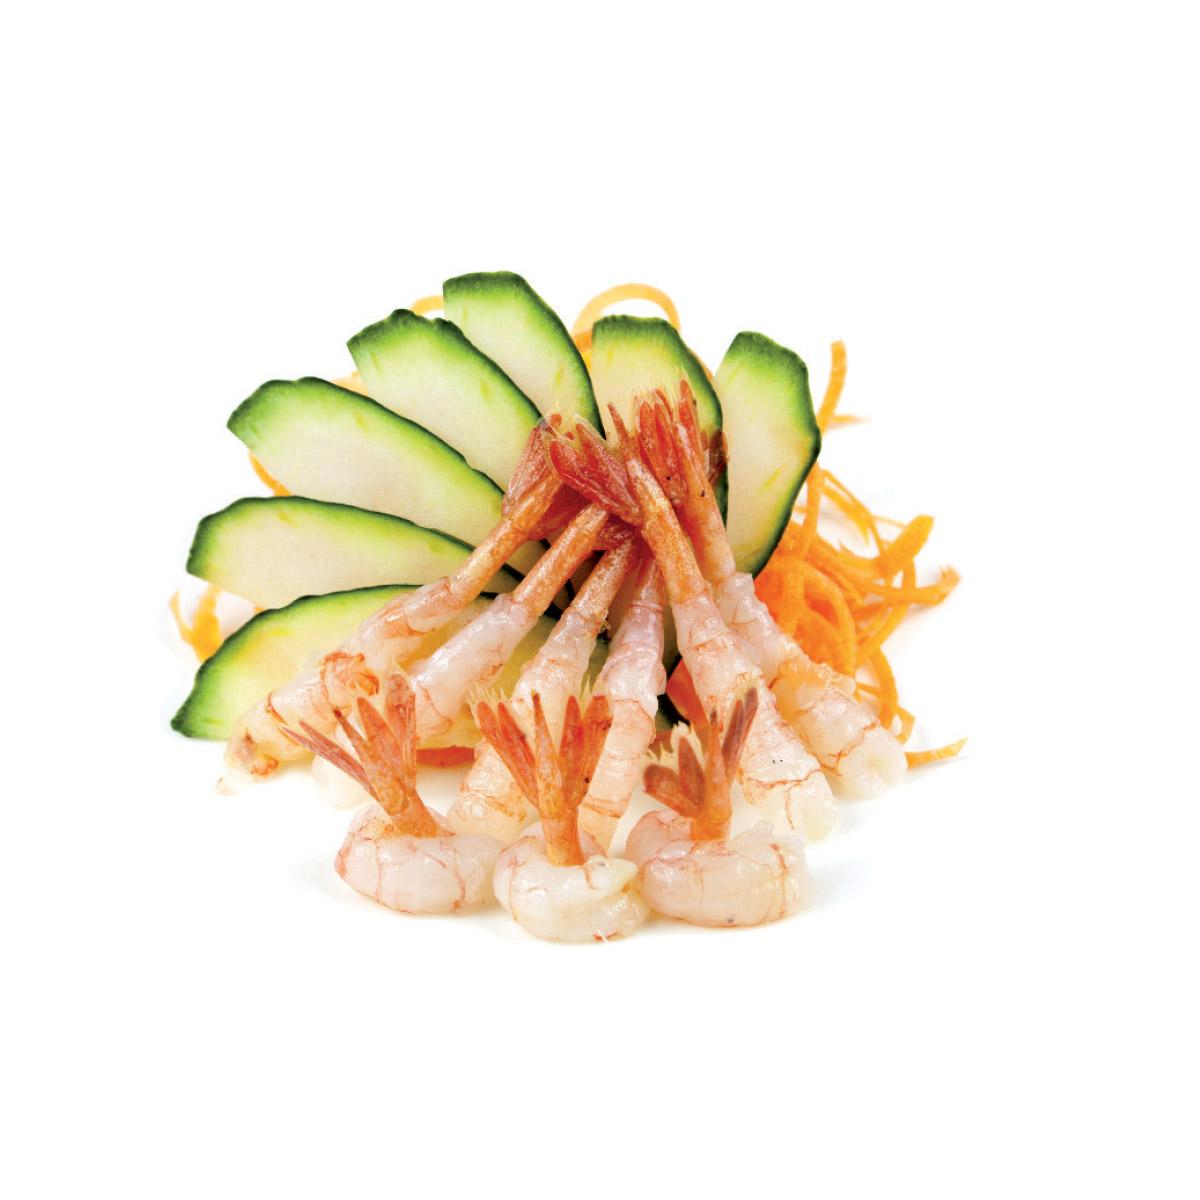 Sushi zensai coupons - Loveland Deals - Best Deals & Coupons in Loveland, CO, Groupon